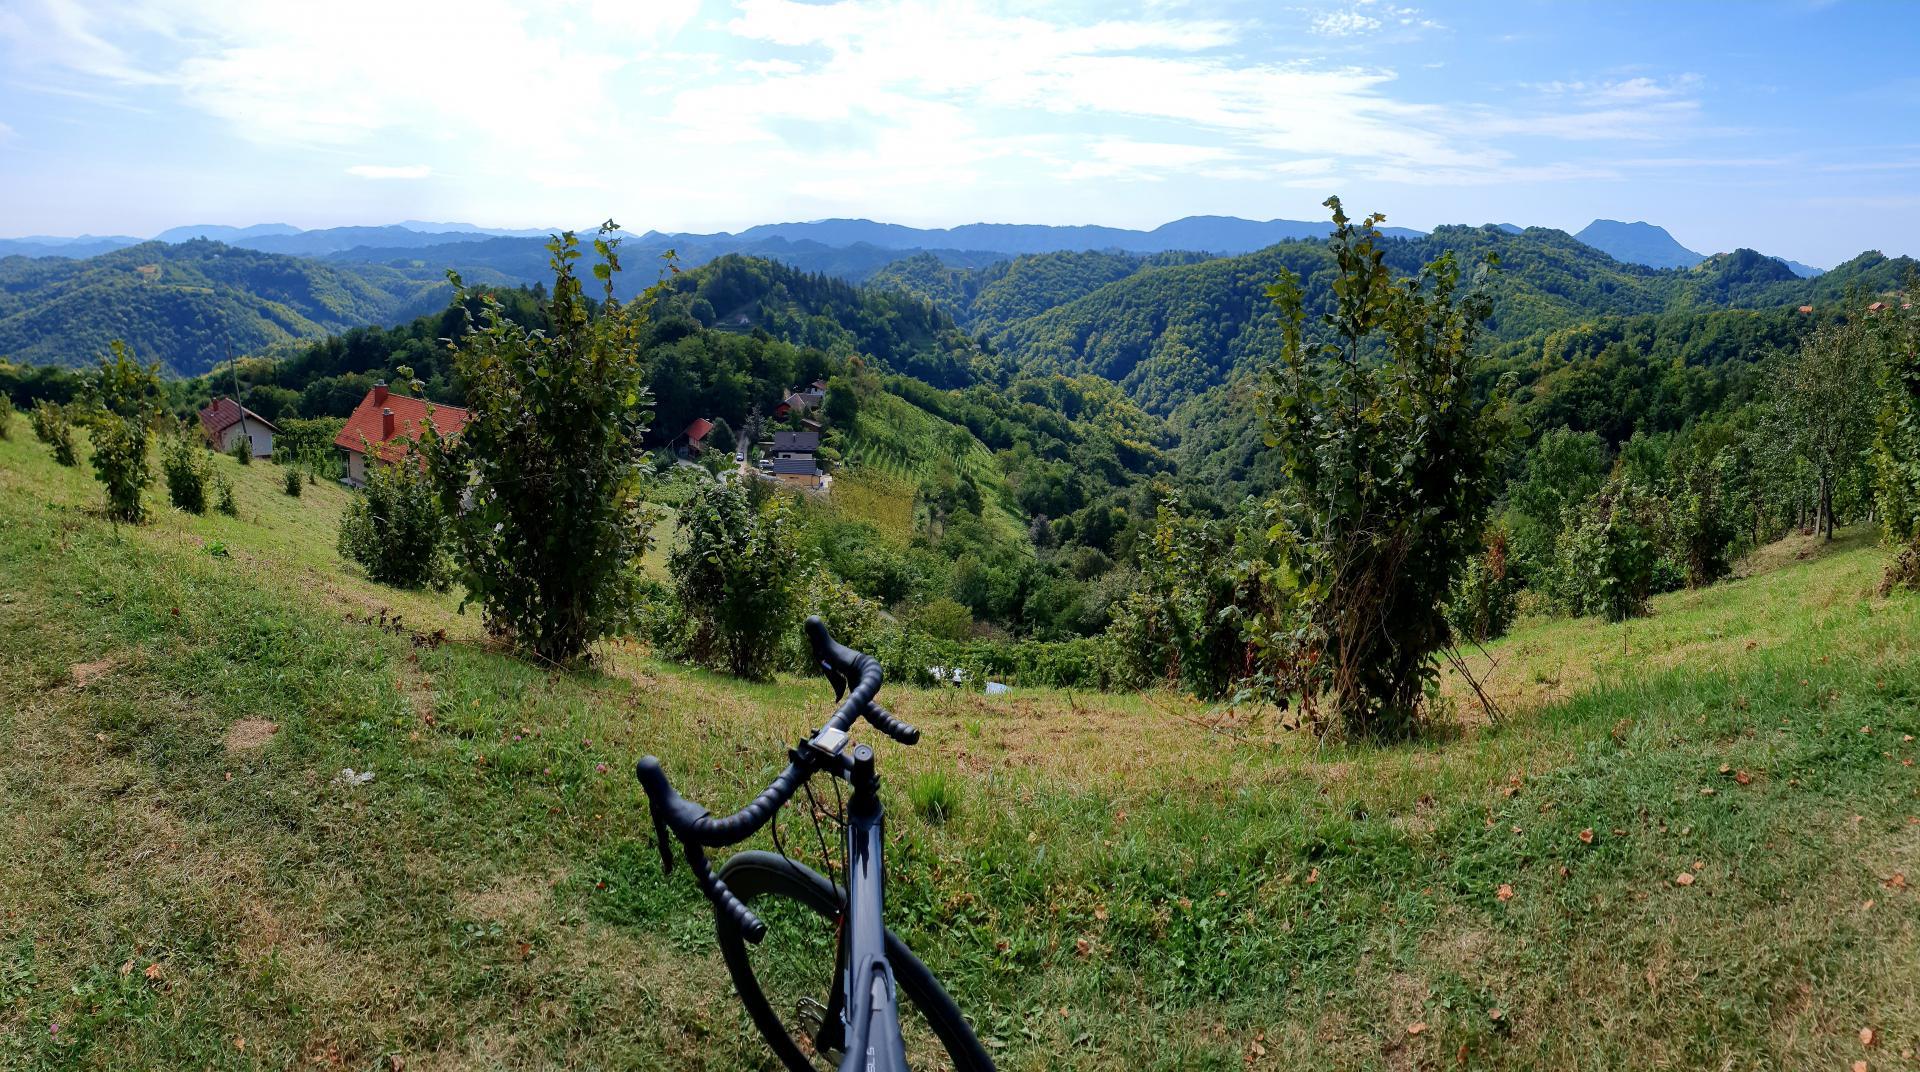 slovenia-gravel-biking-trek-domane-sl-5-disc